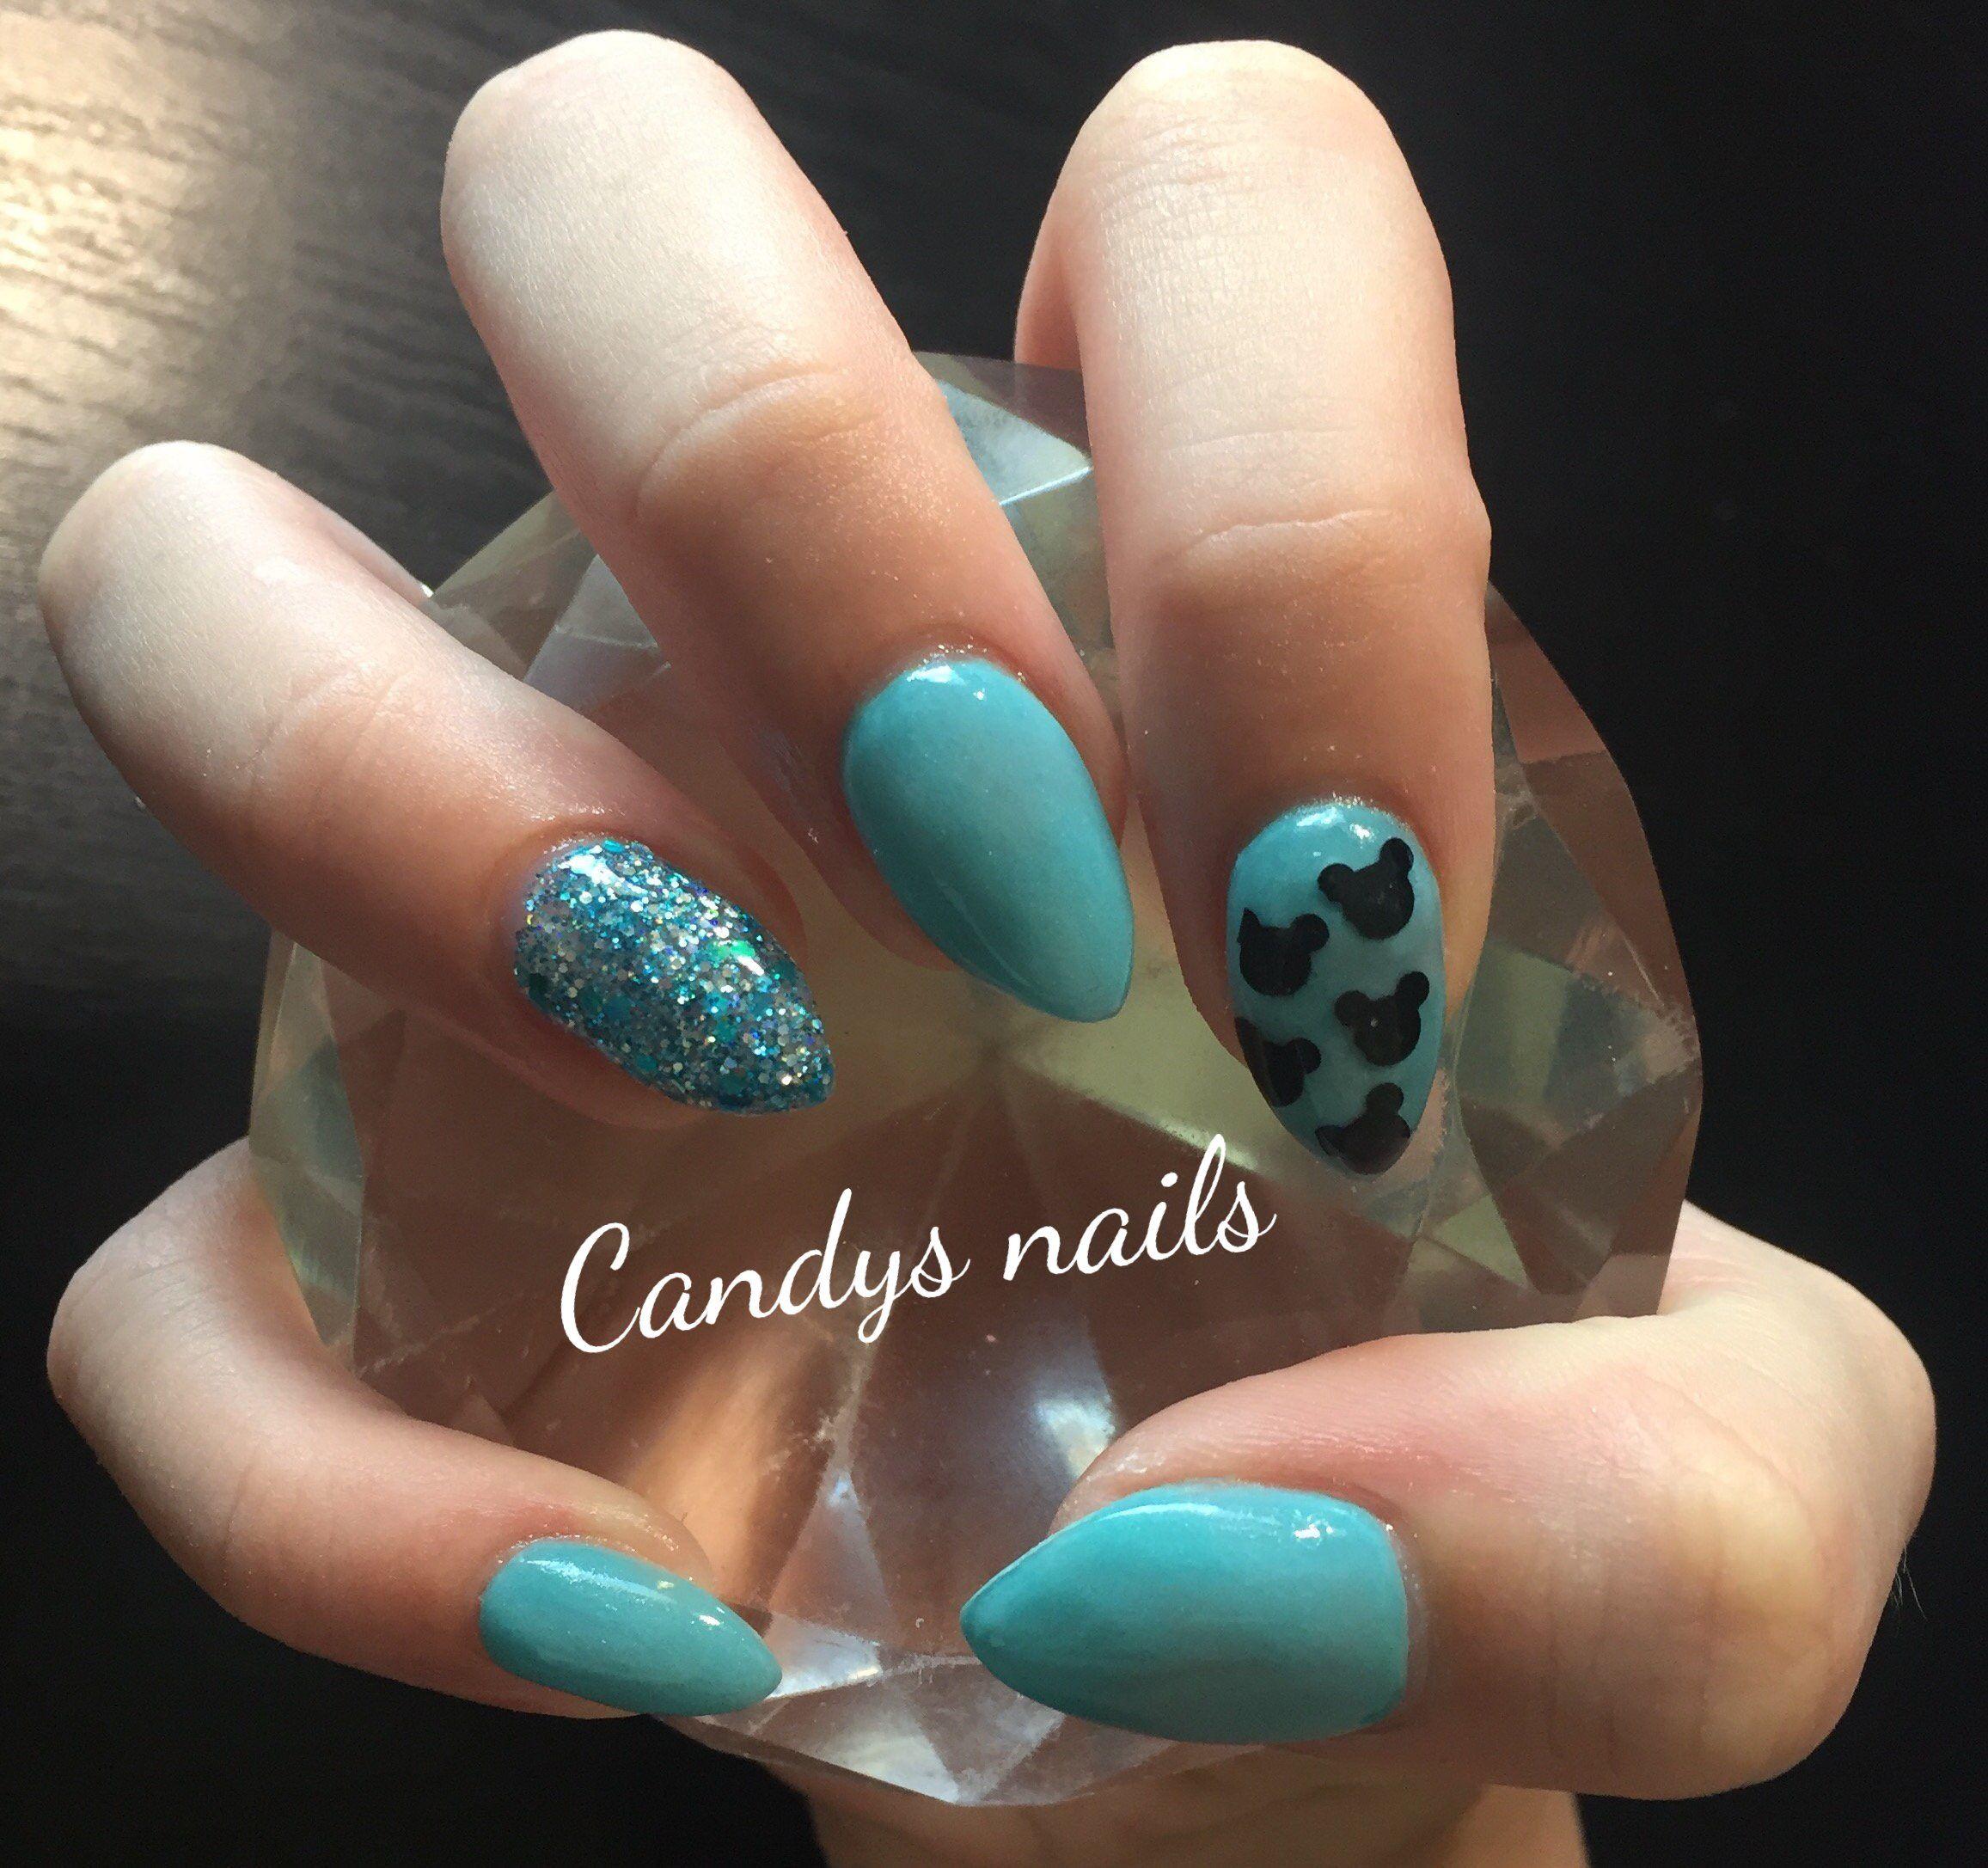 Teal Mickey Mouse Disney acrylic nails! | Candys Nails | Pinterest